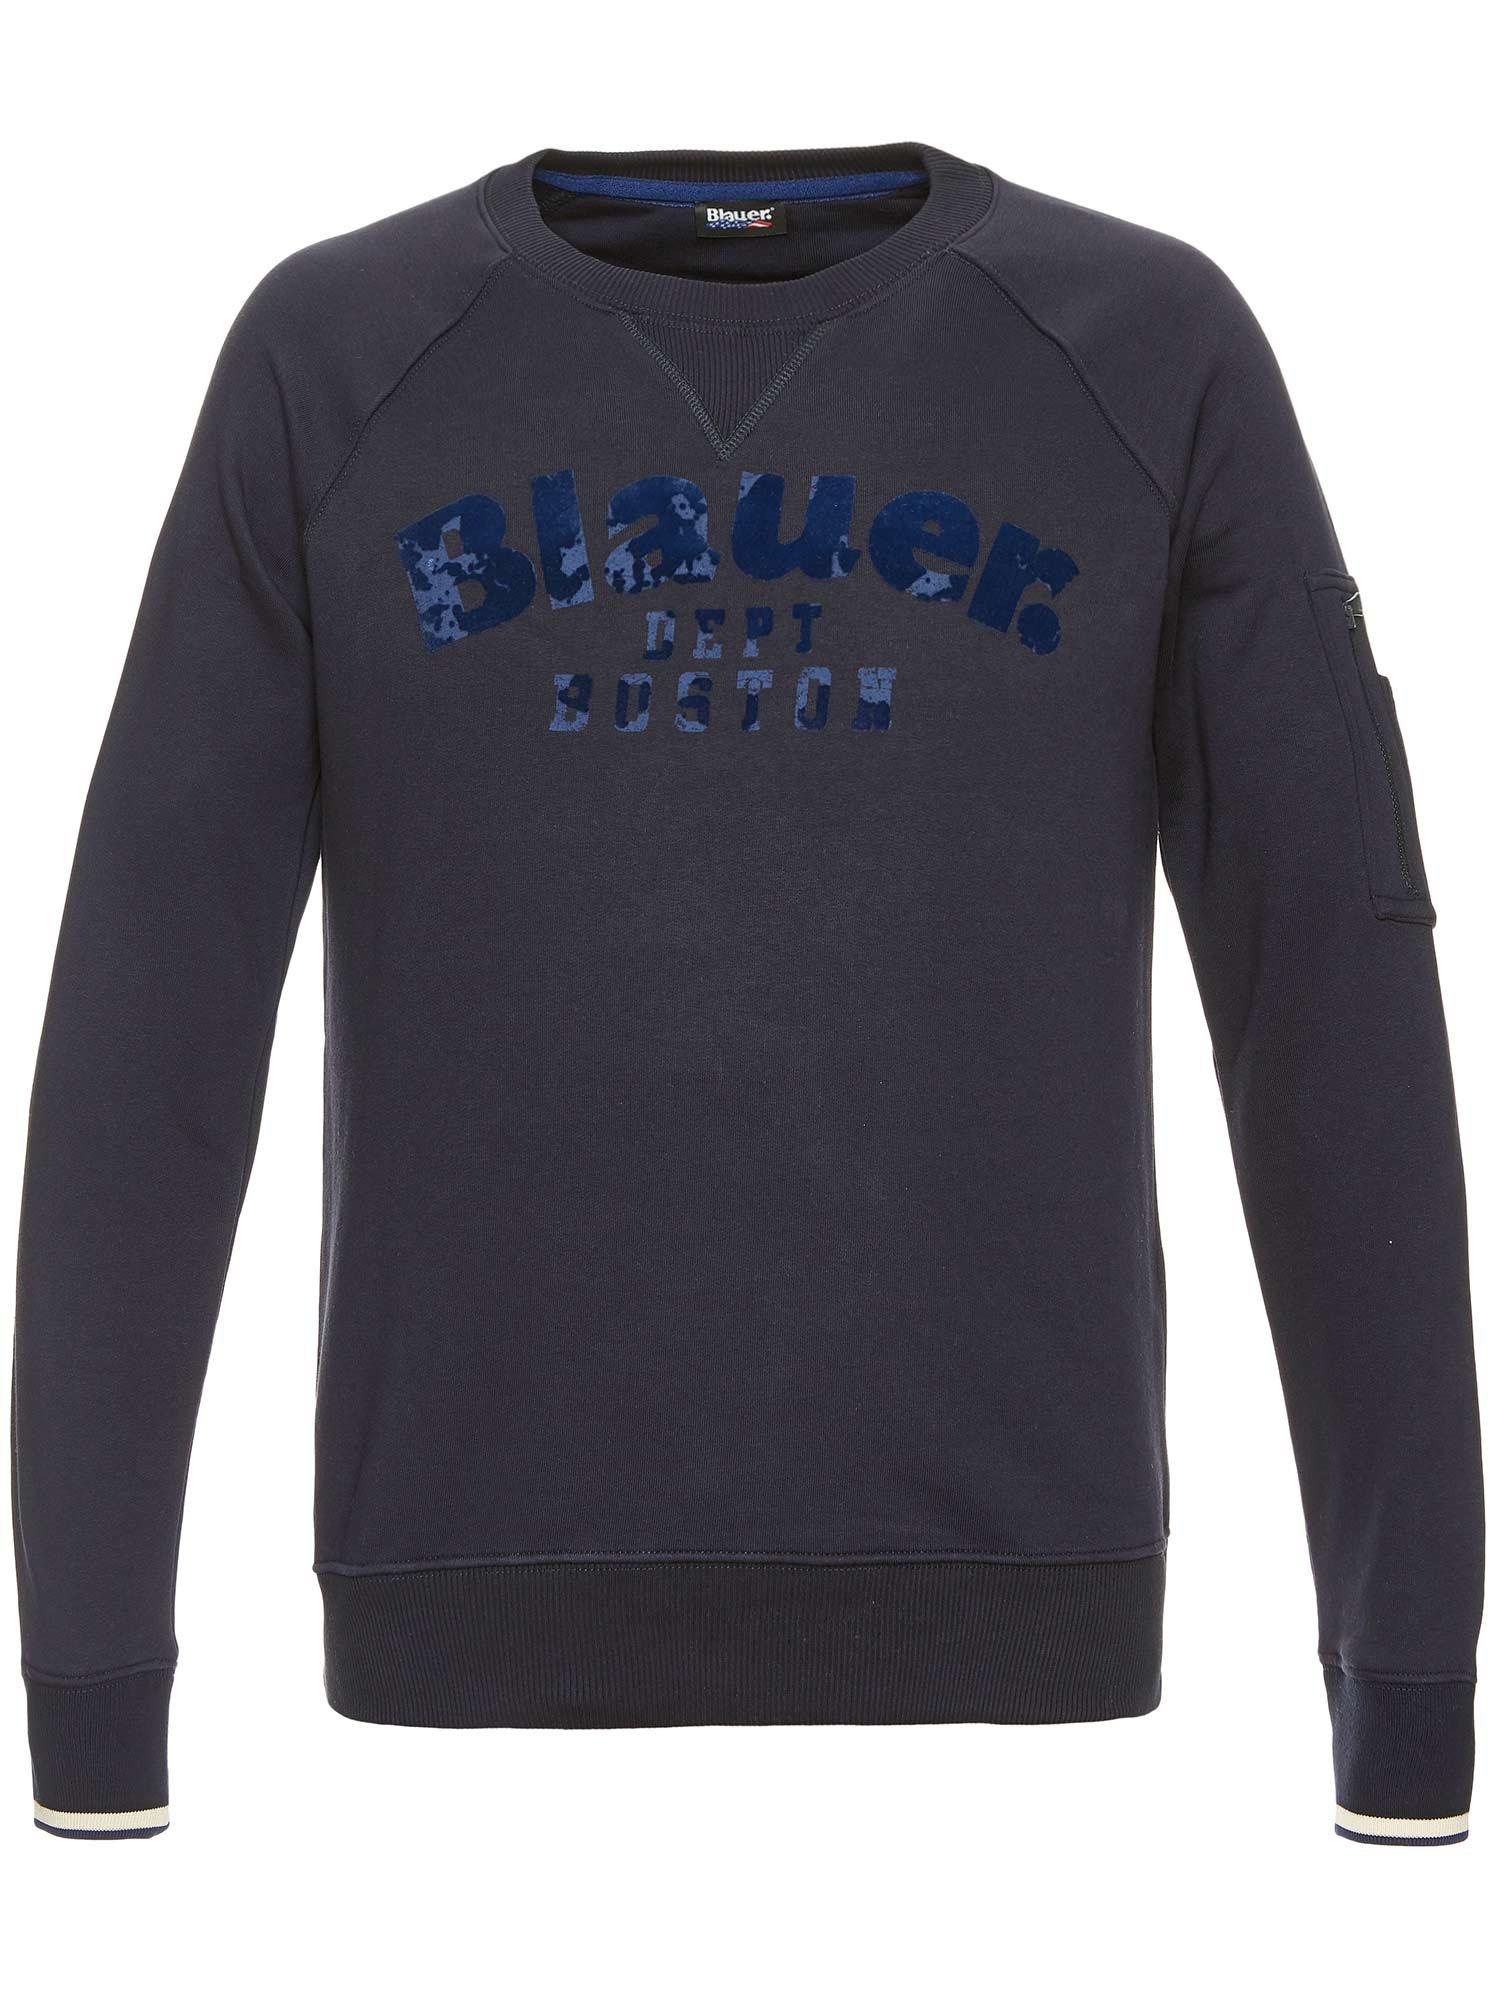 DEPT. BOSTON CREW NECK SWEATSHIRT - Blauer